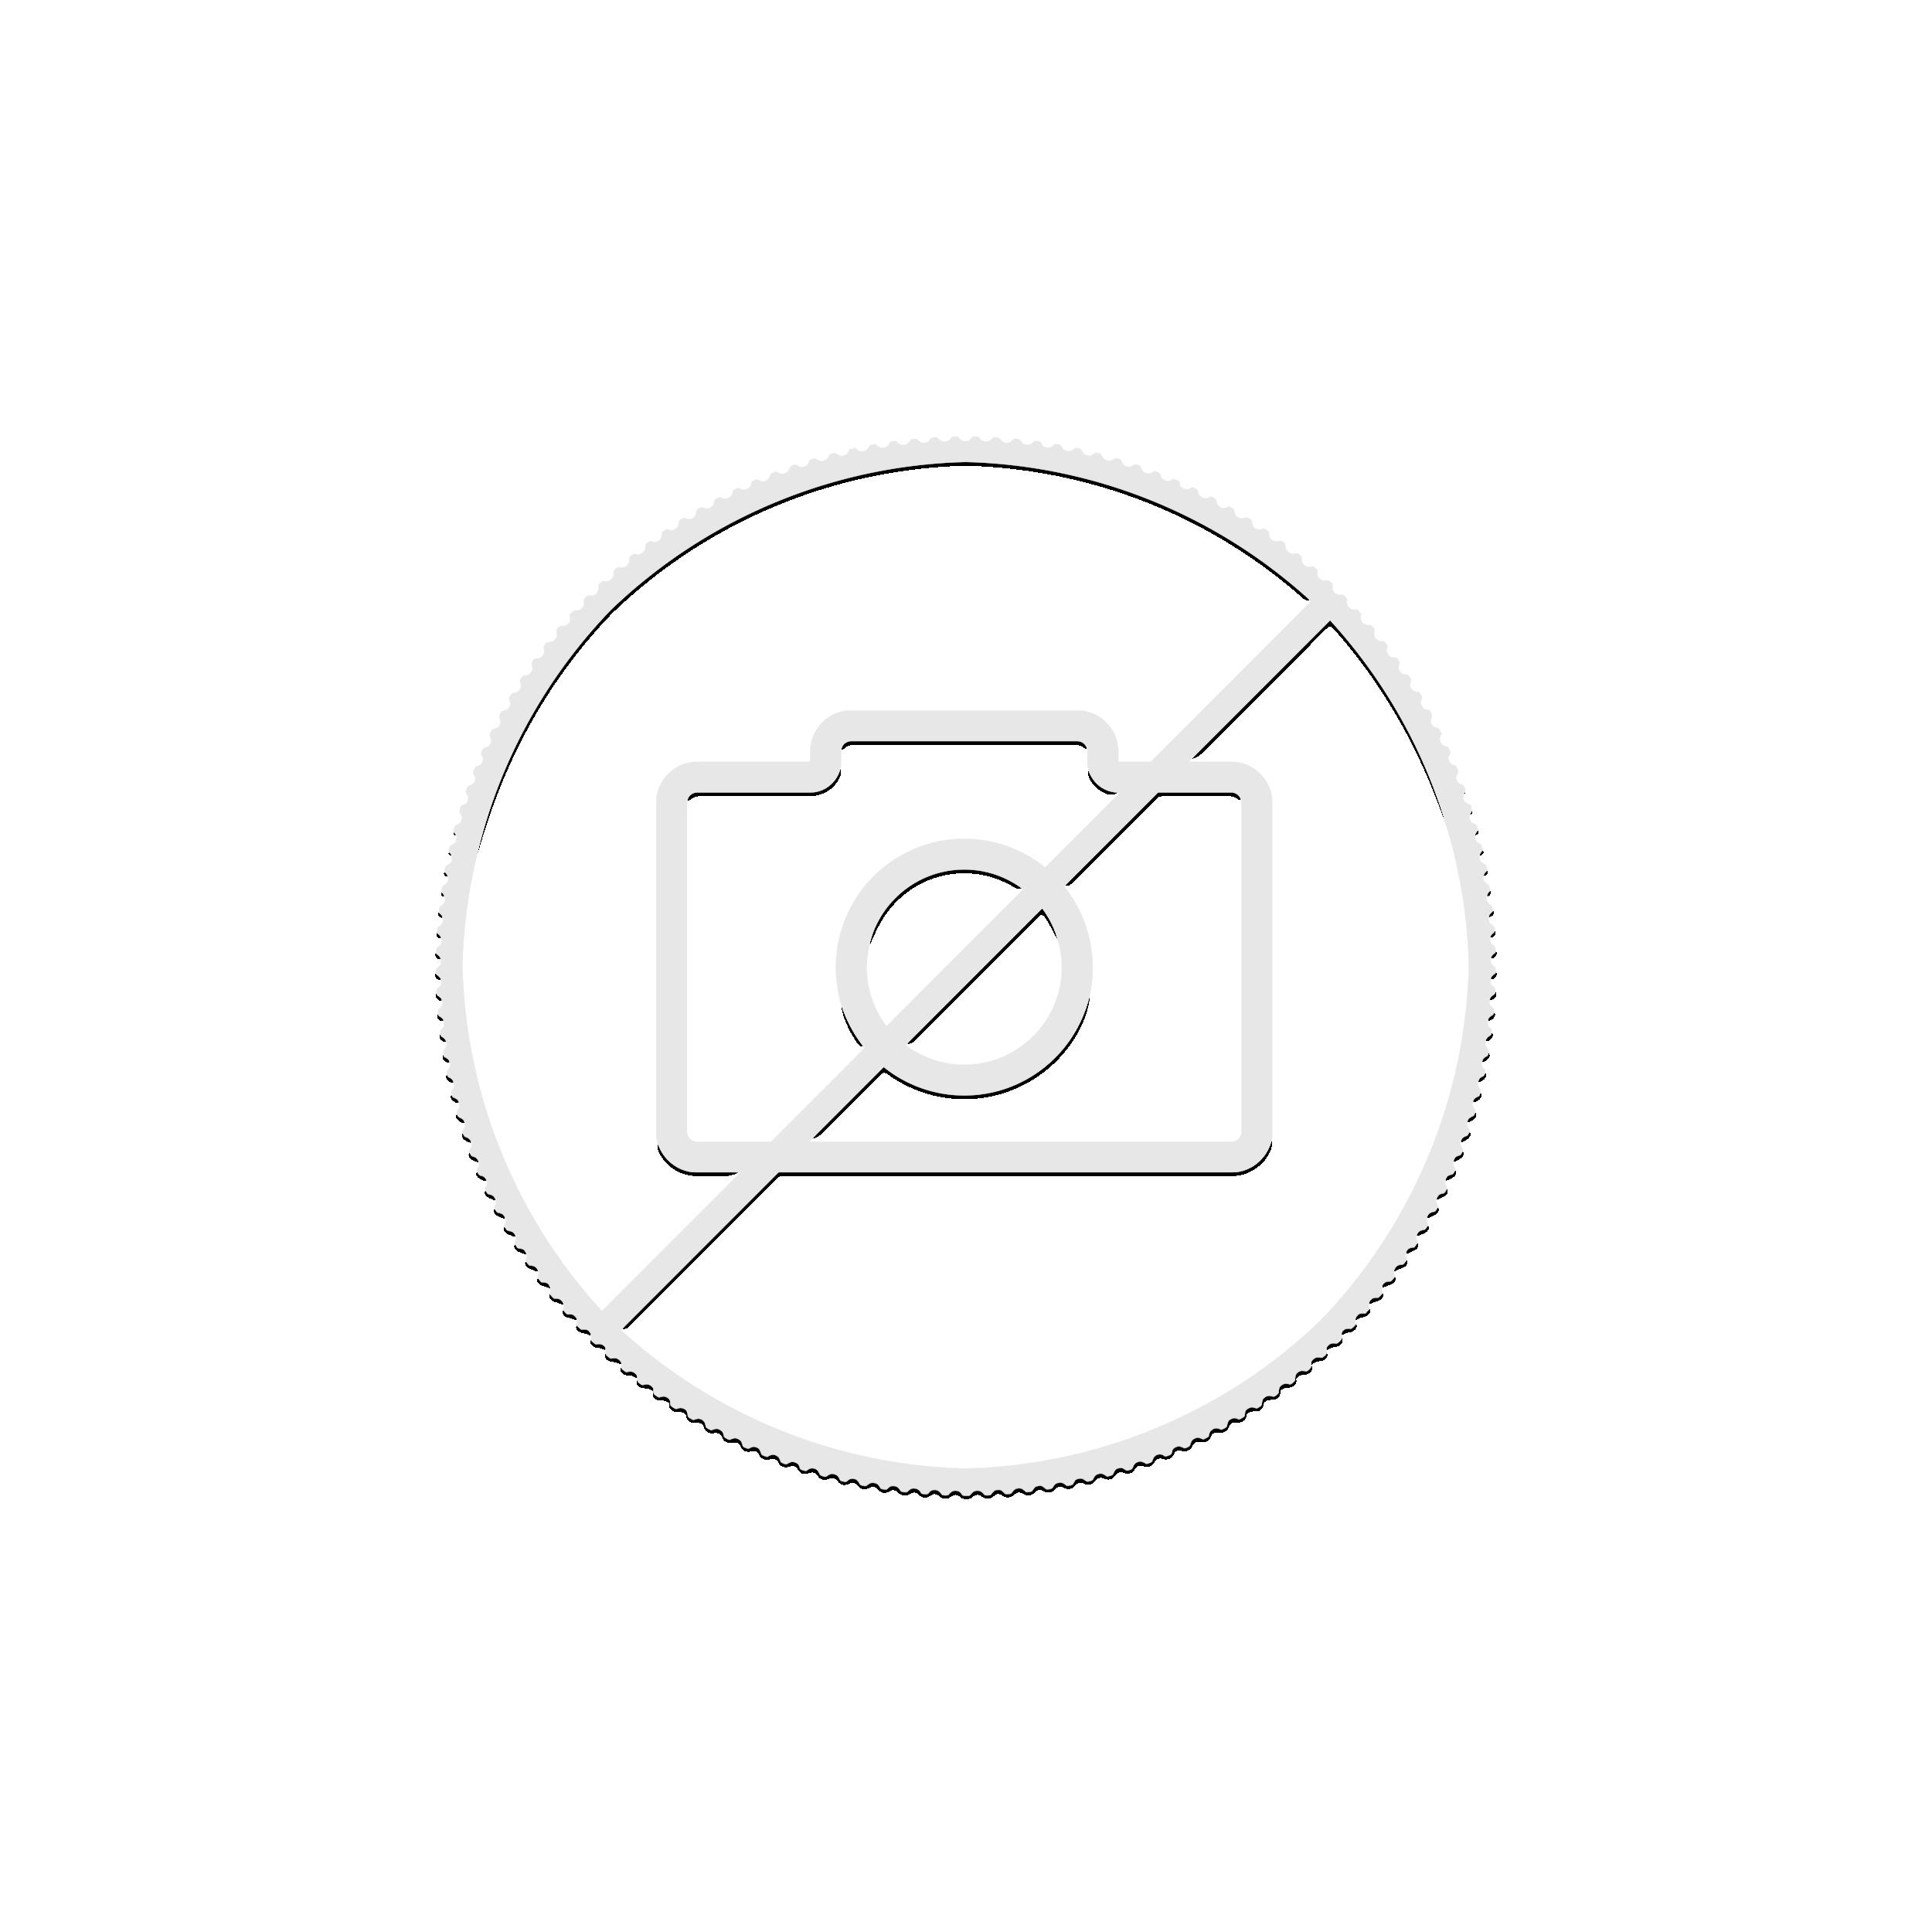 Kookaburra zilver munt 2009 10 troy ounce